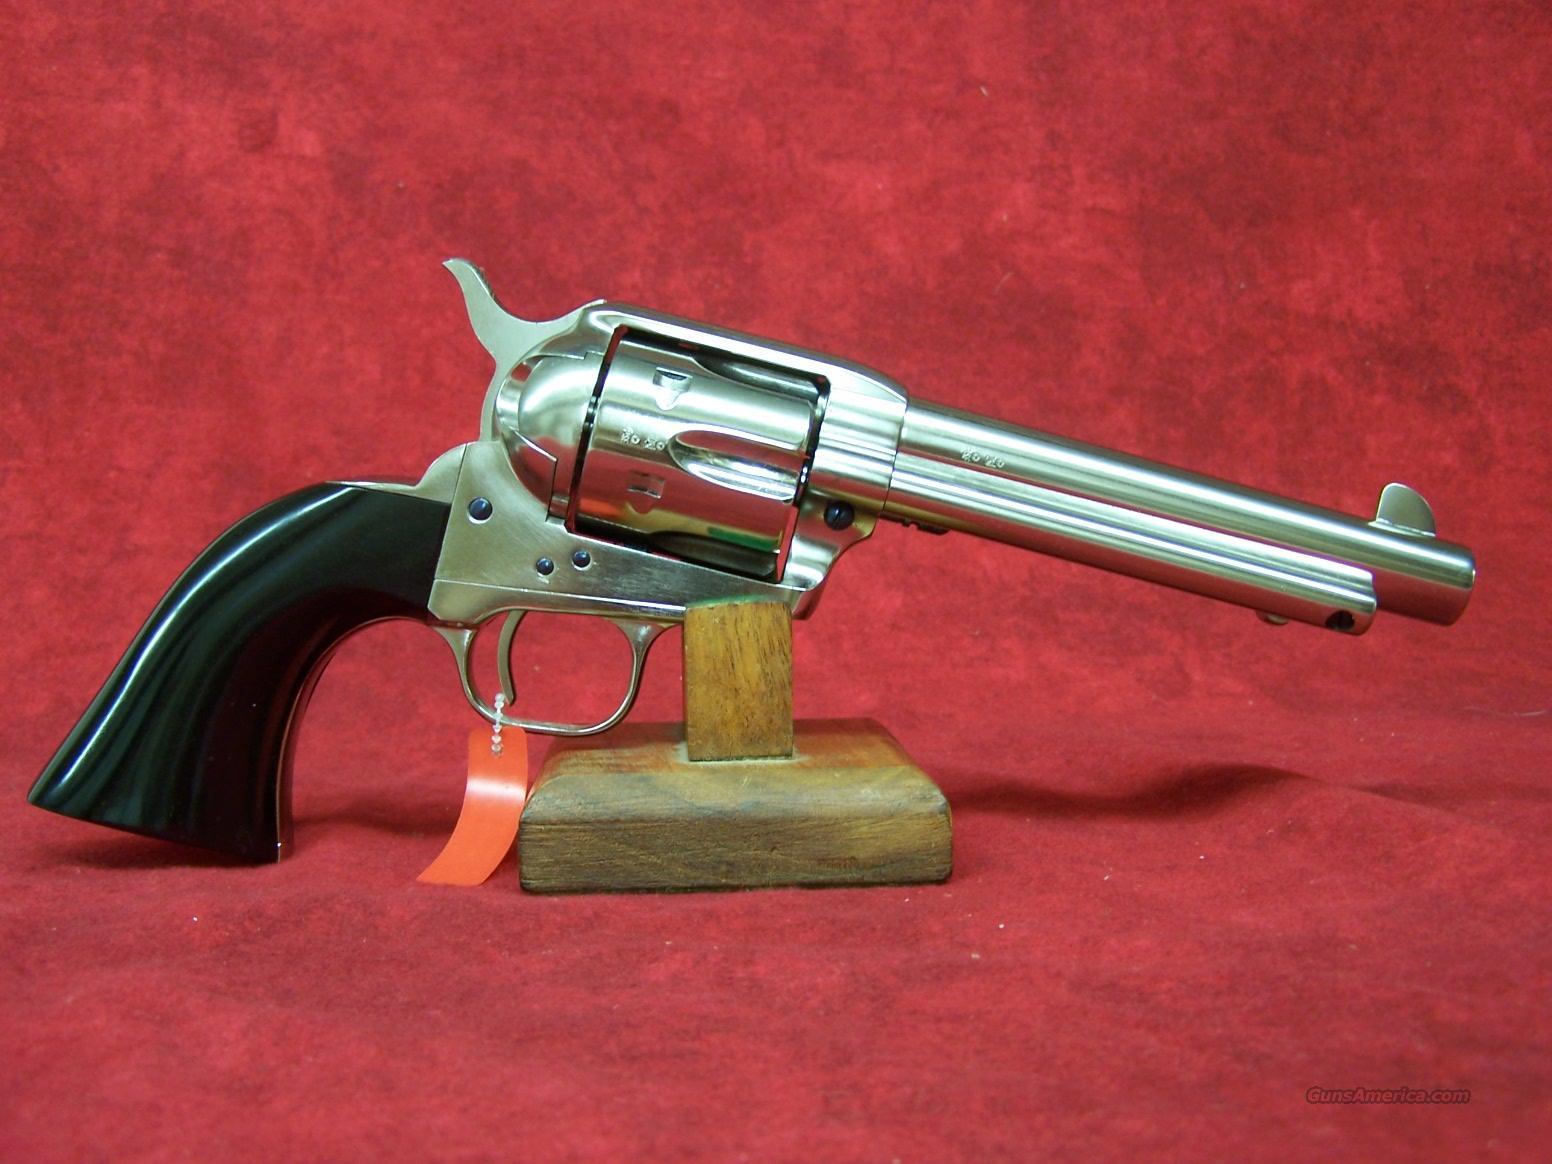 "Uberti 1873 Cattleman Desperado Nickel 5 1/2"" .45LC  (356031)  Guns > Pistols > Uberti Pistols > Ctg."